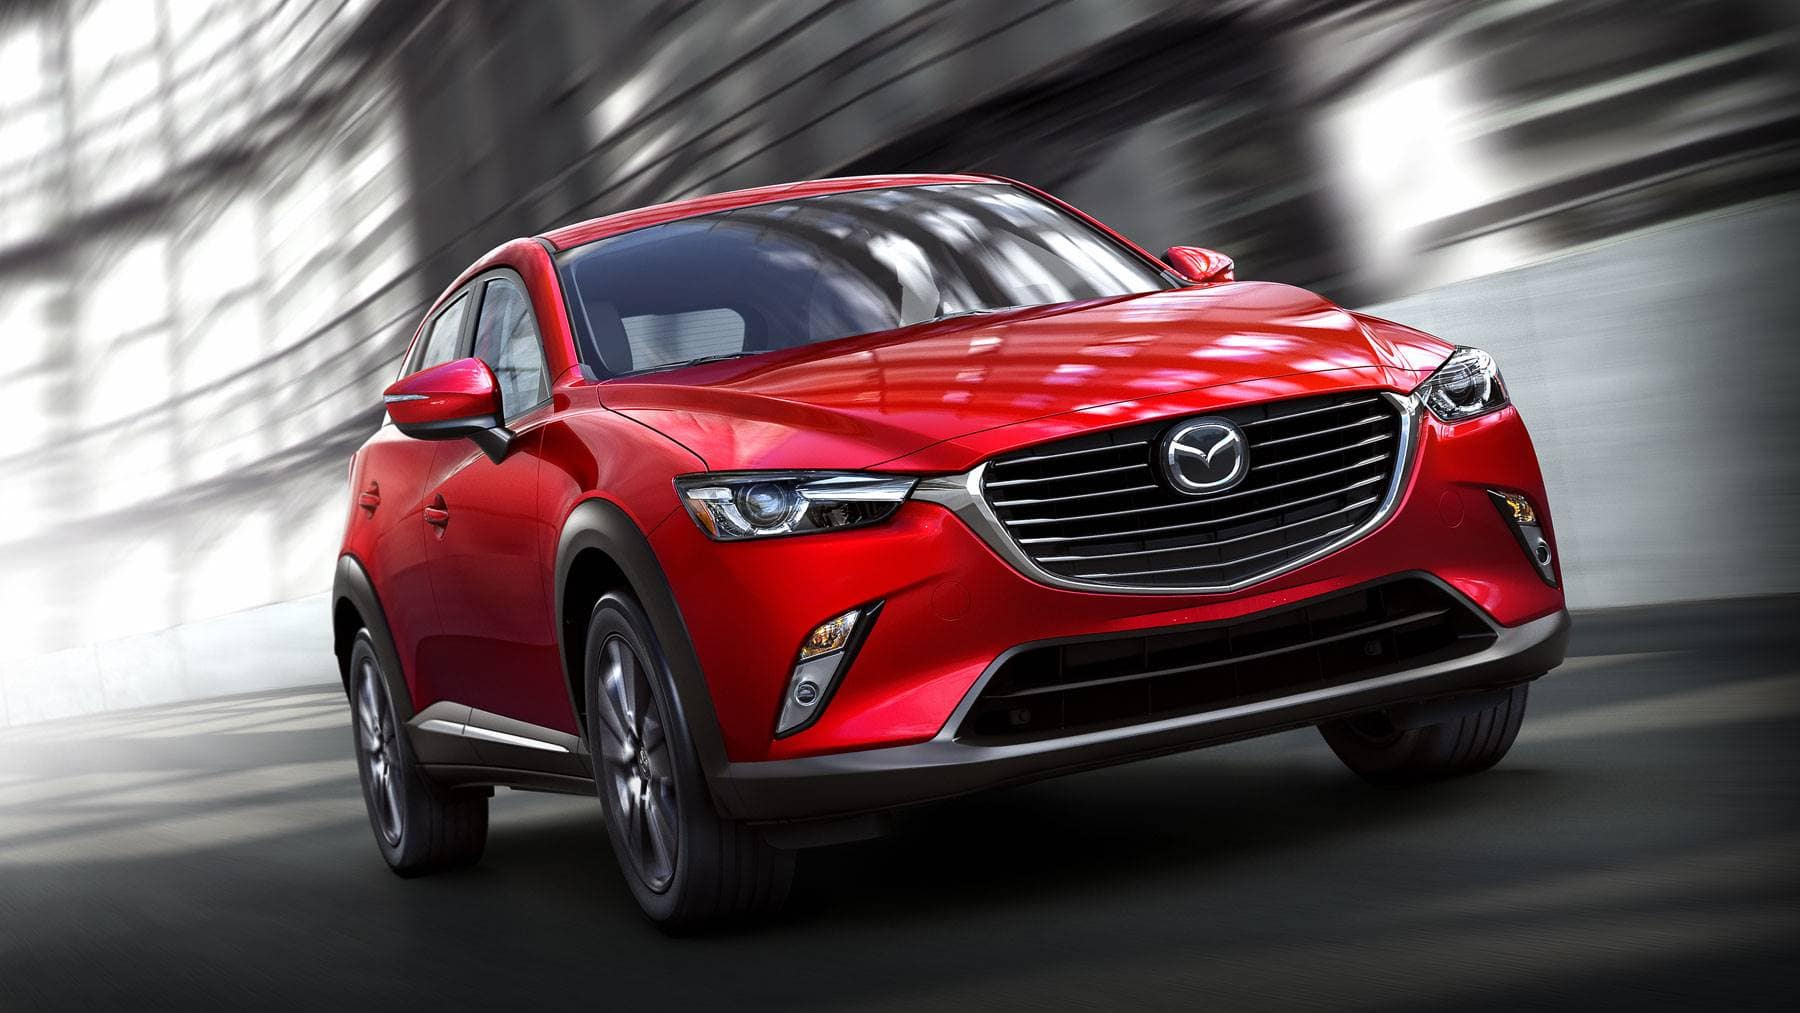 Mazda Cx 3 Lease >> How To Lease A Mazda In Escondido Mazda Of Escondido